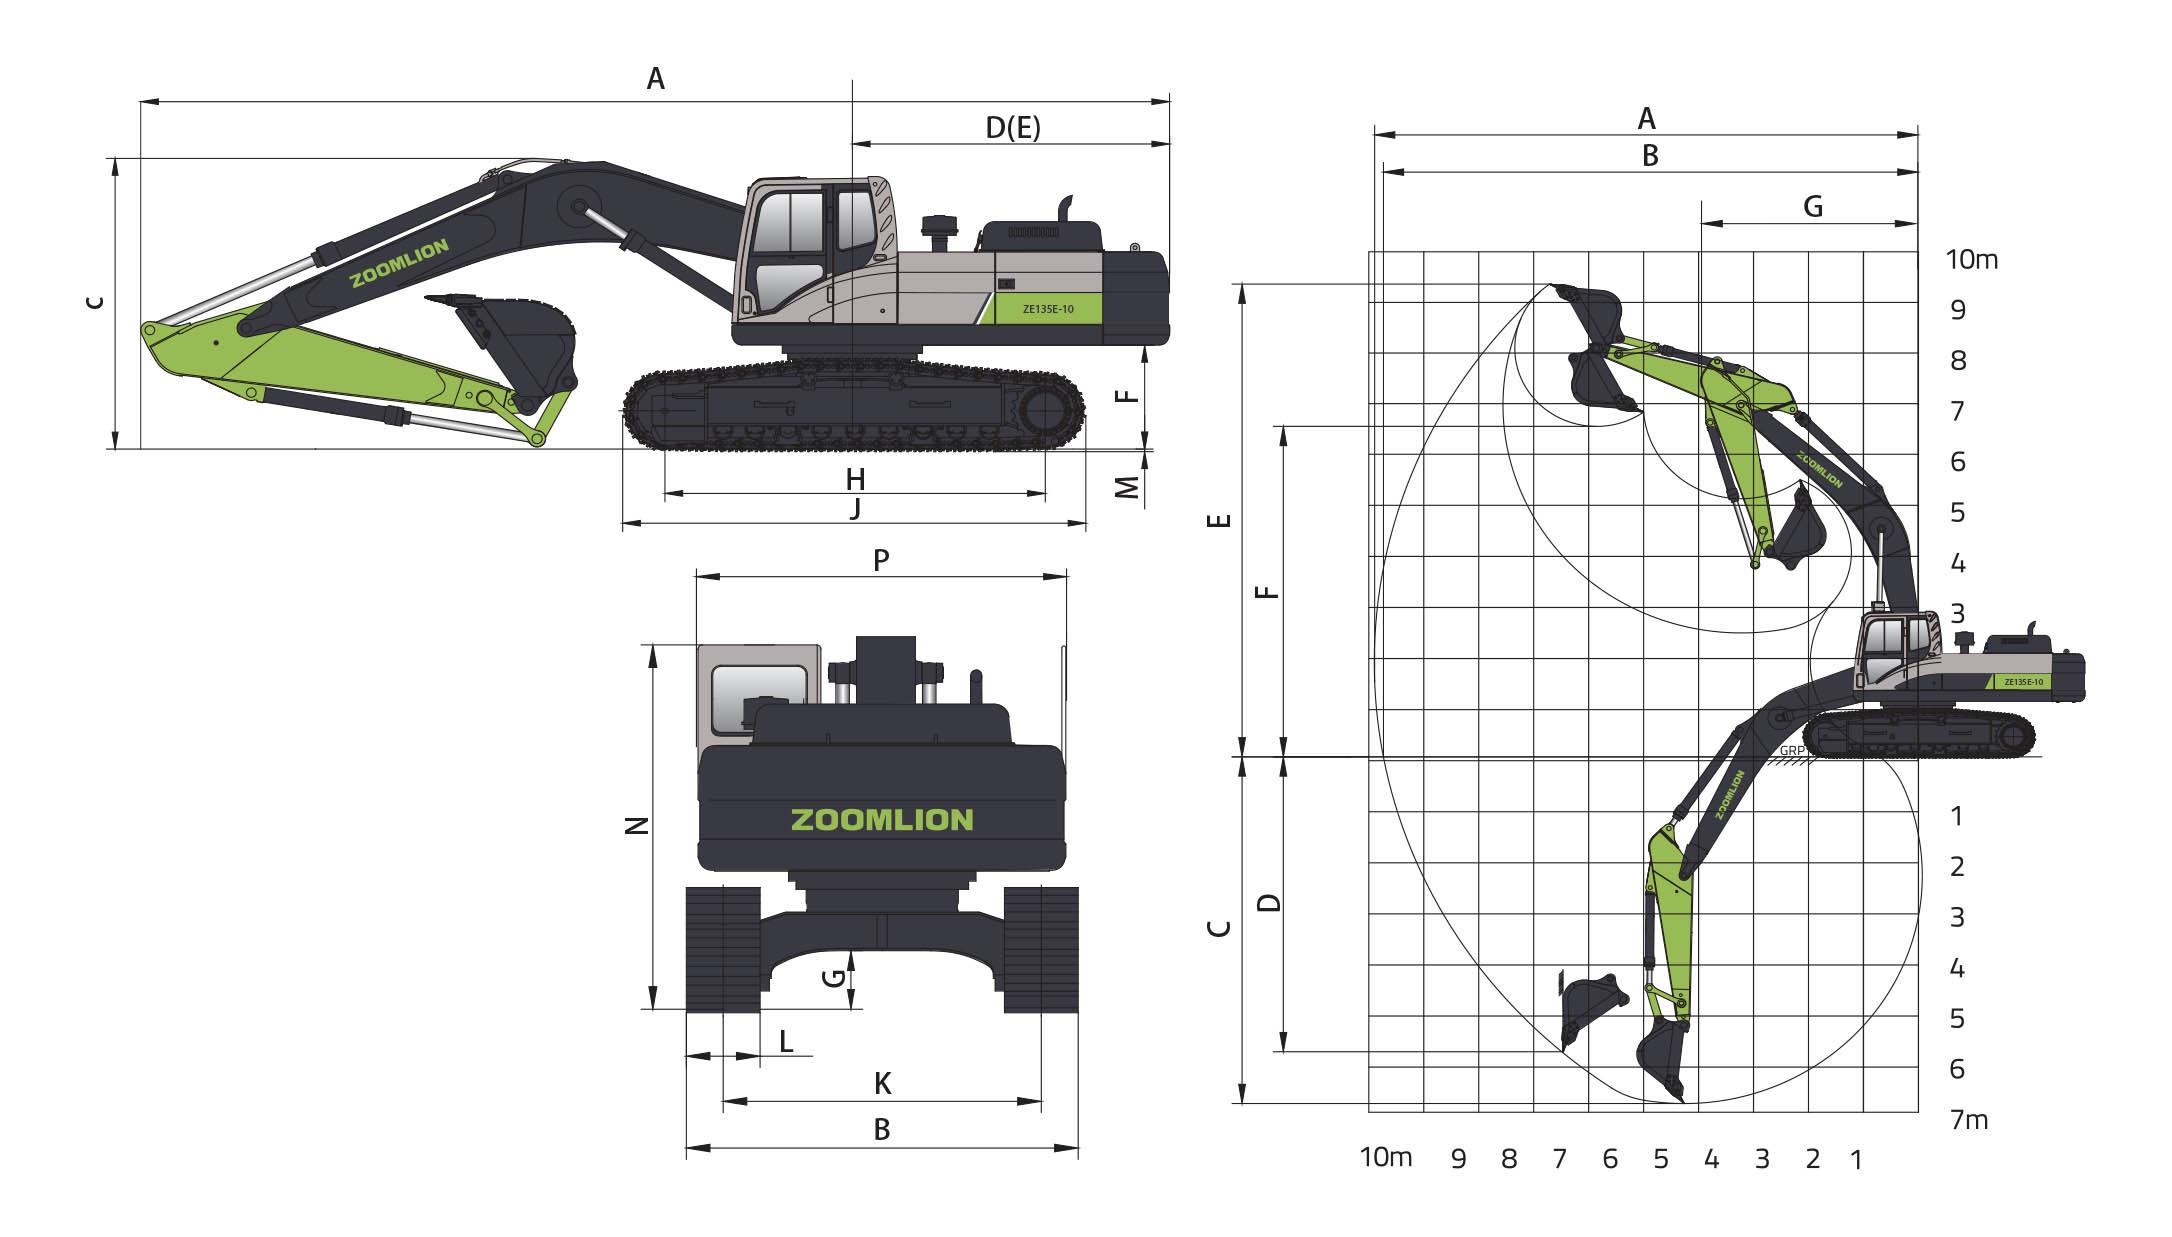 Размеры экскаватора ZE135E-10 Zoomlion